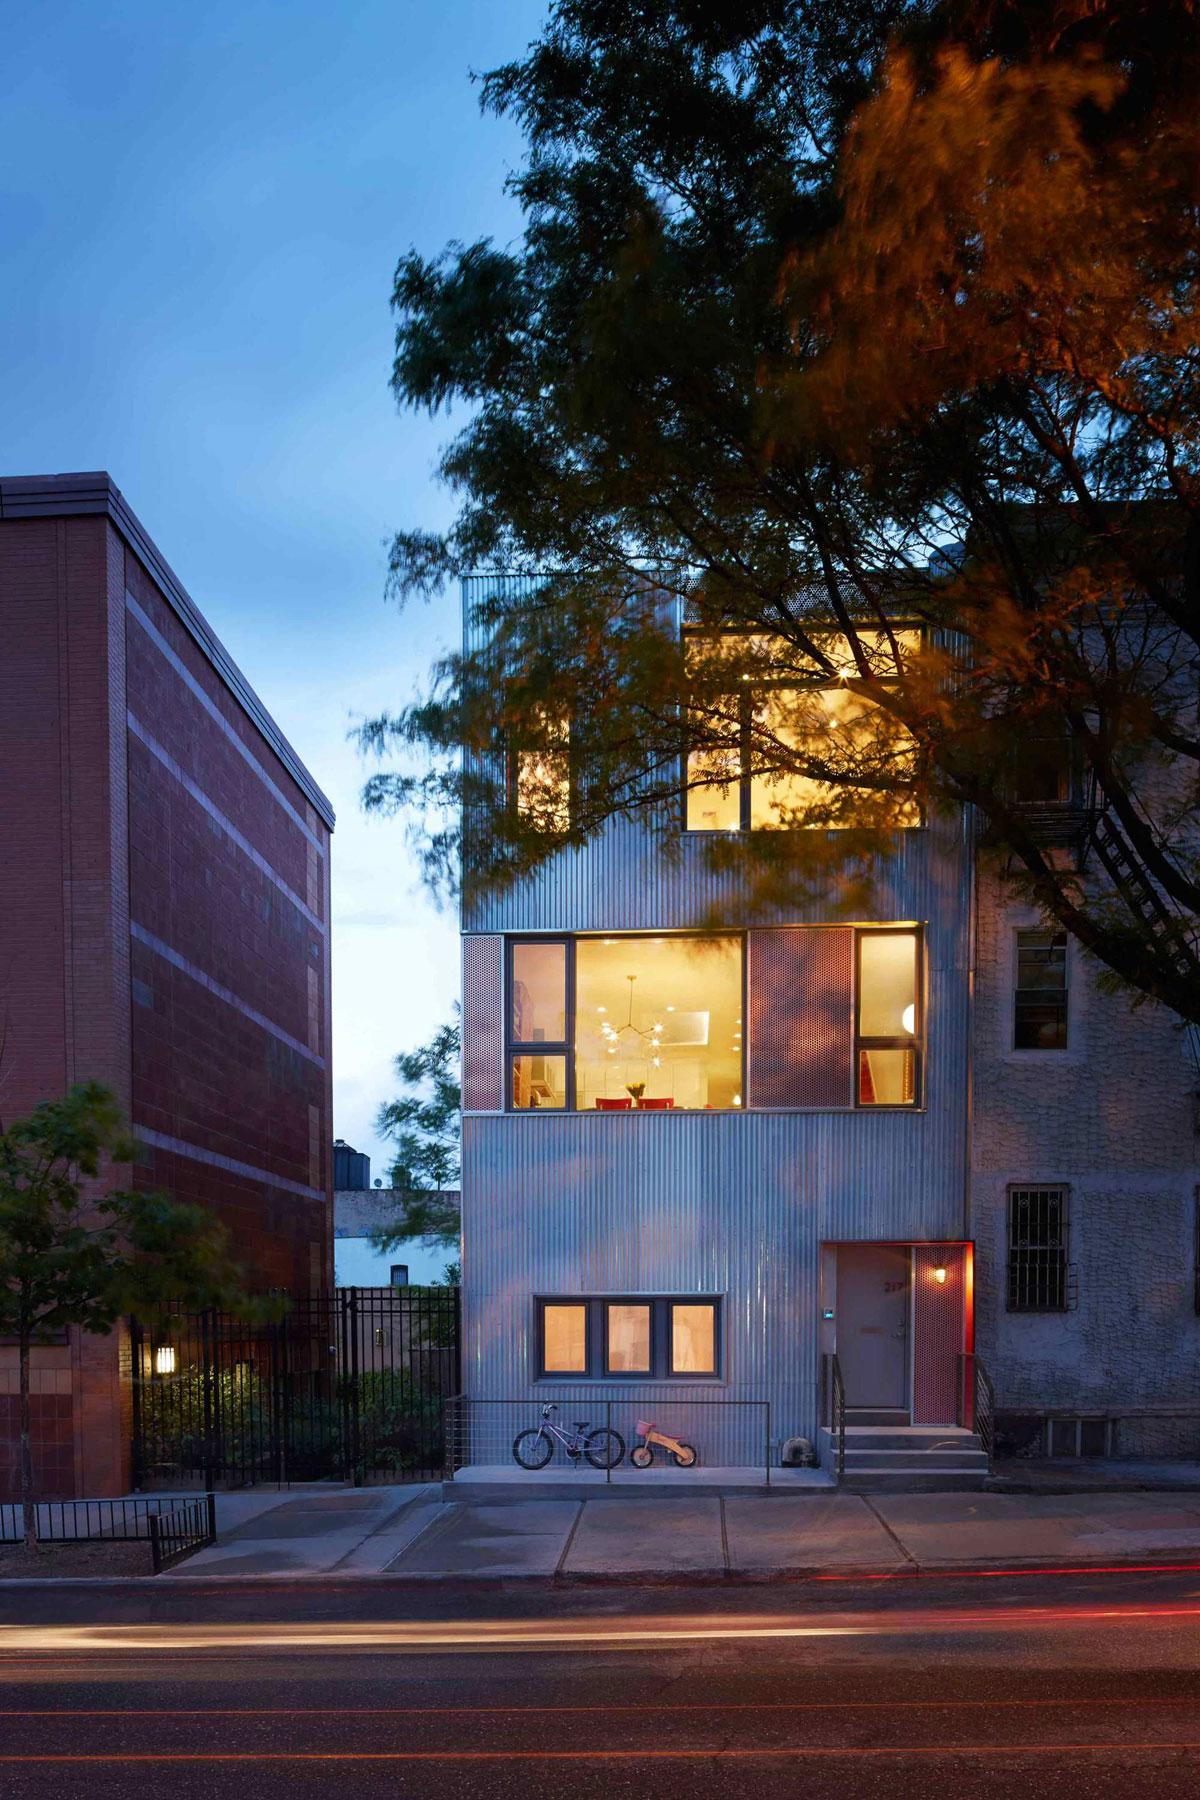 Gutman-Umansky Townhouse by Etelamaki Architecture-14